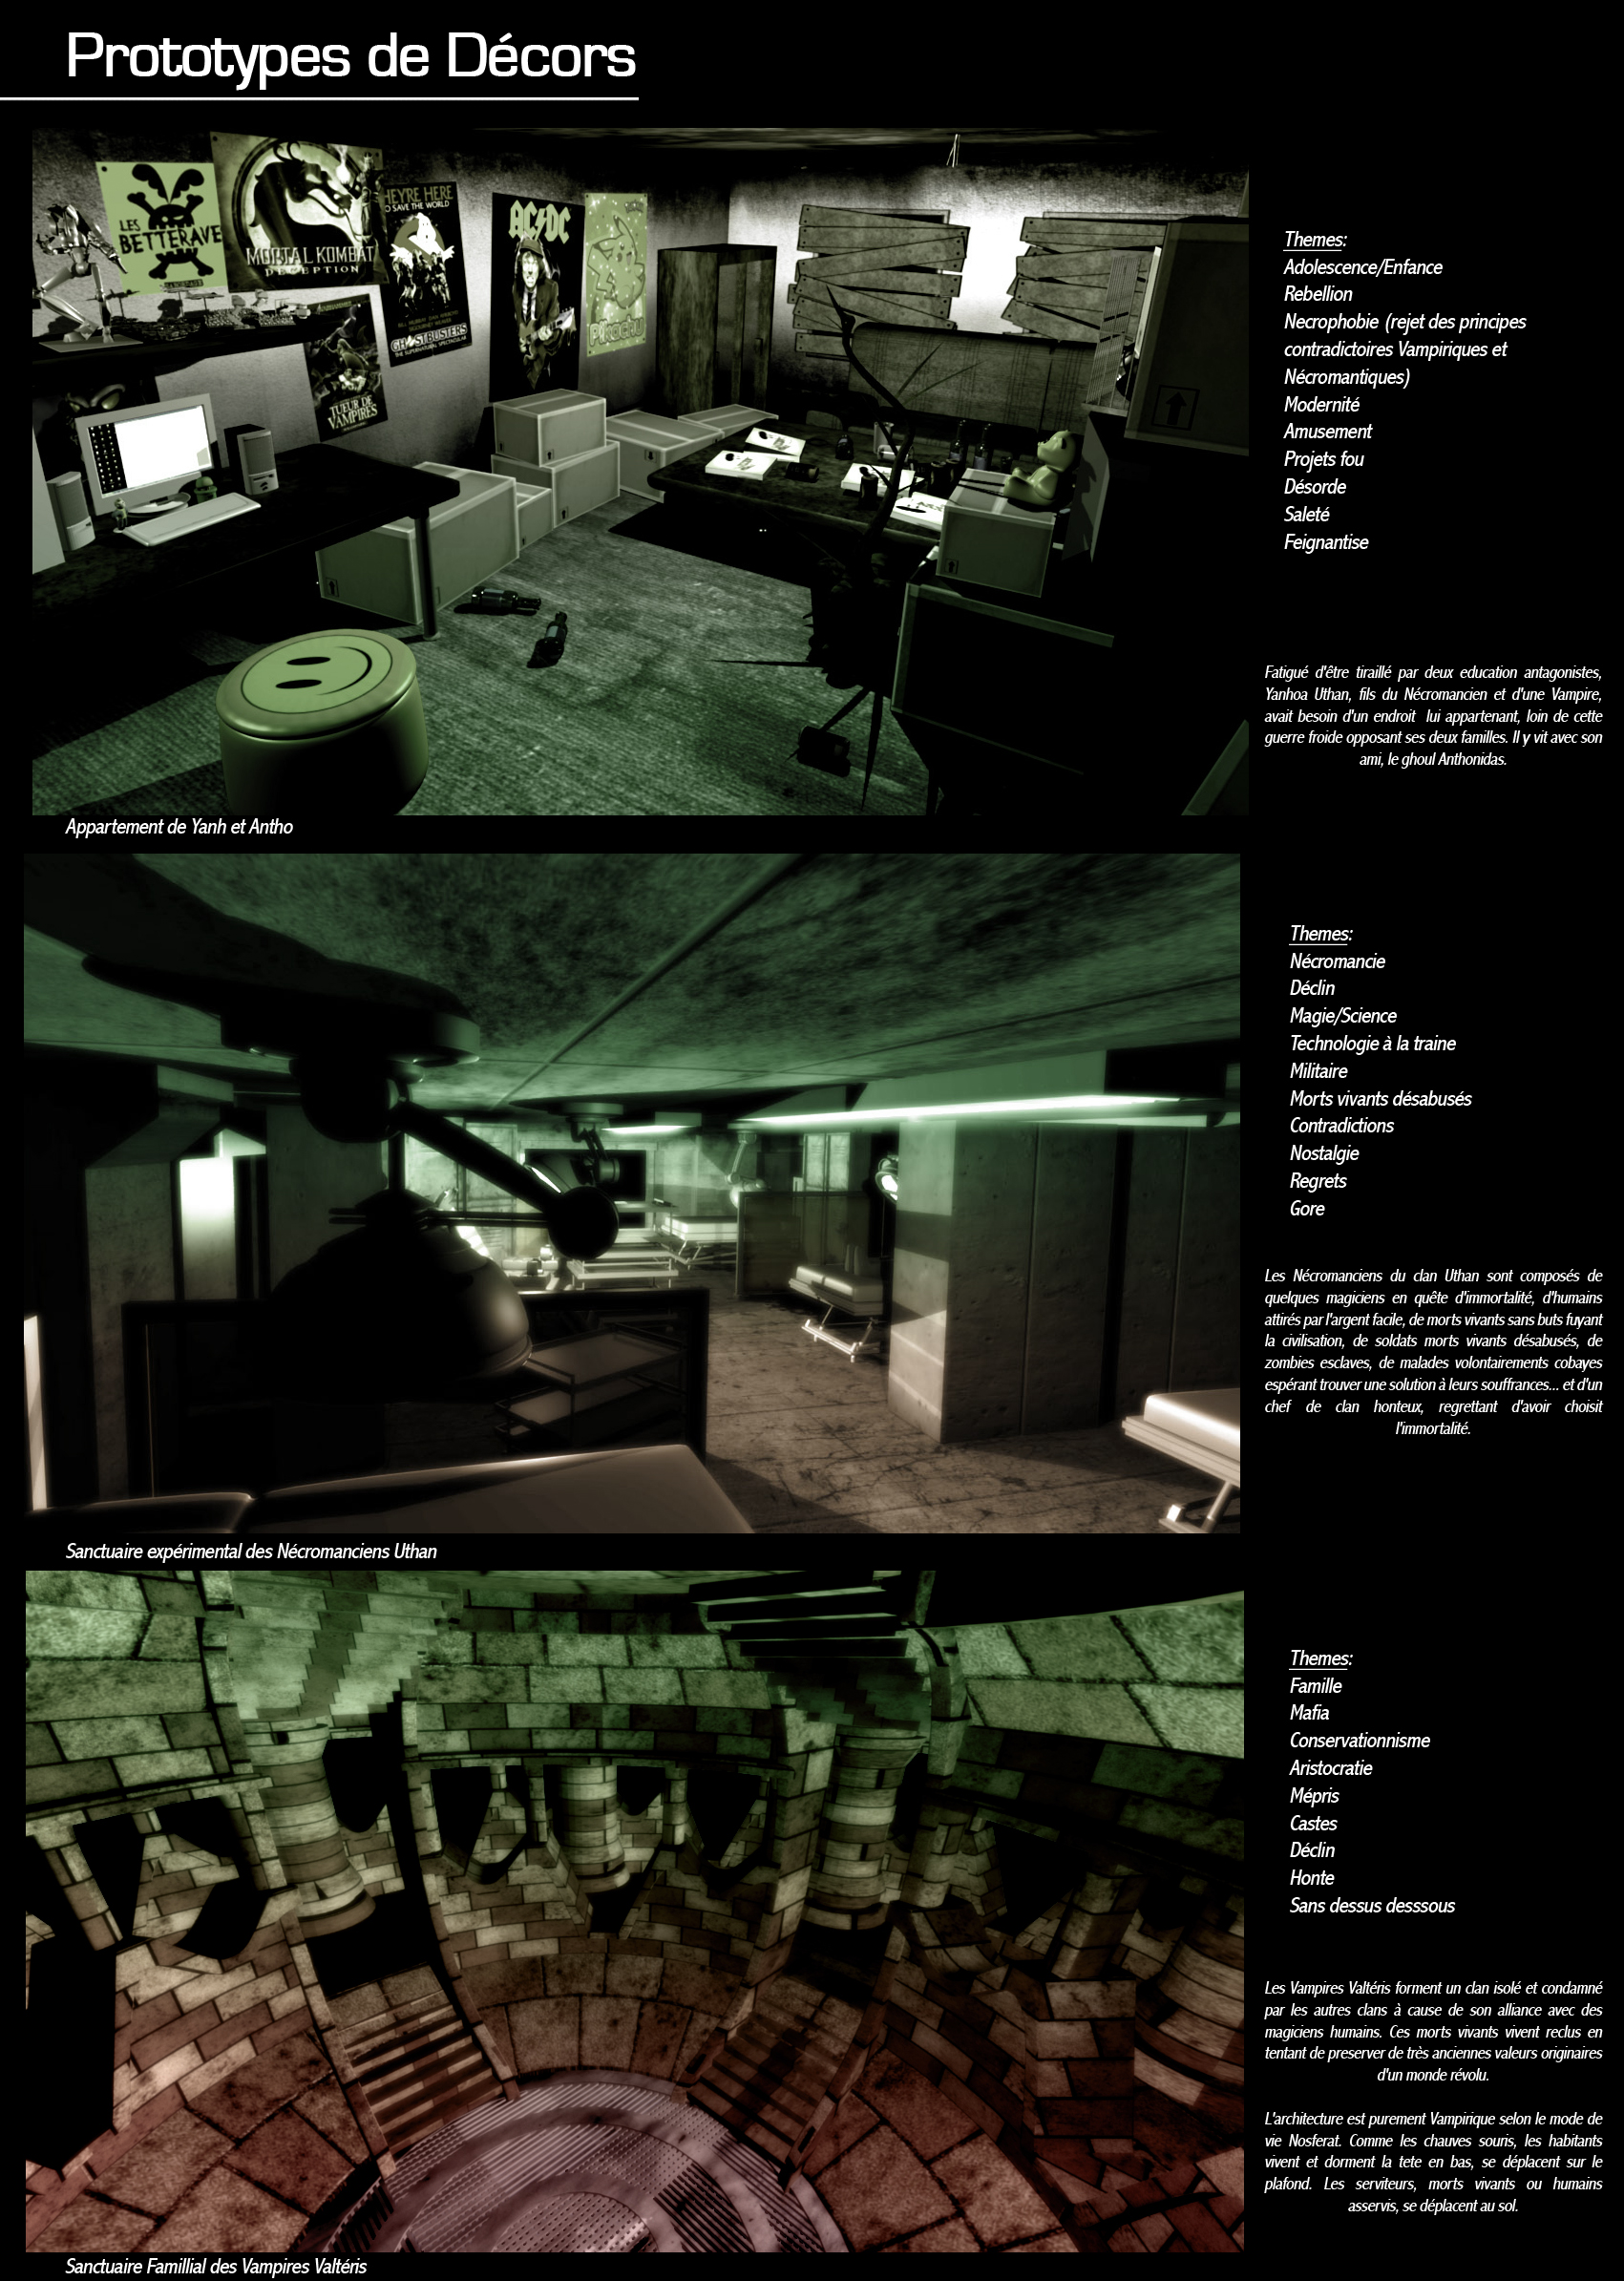 prototypesdedcors2.jpg